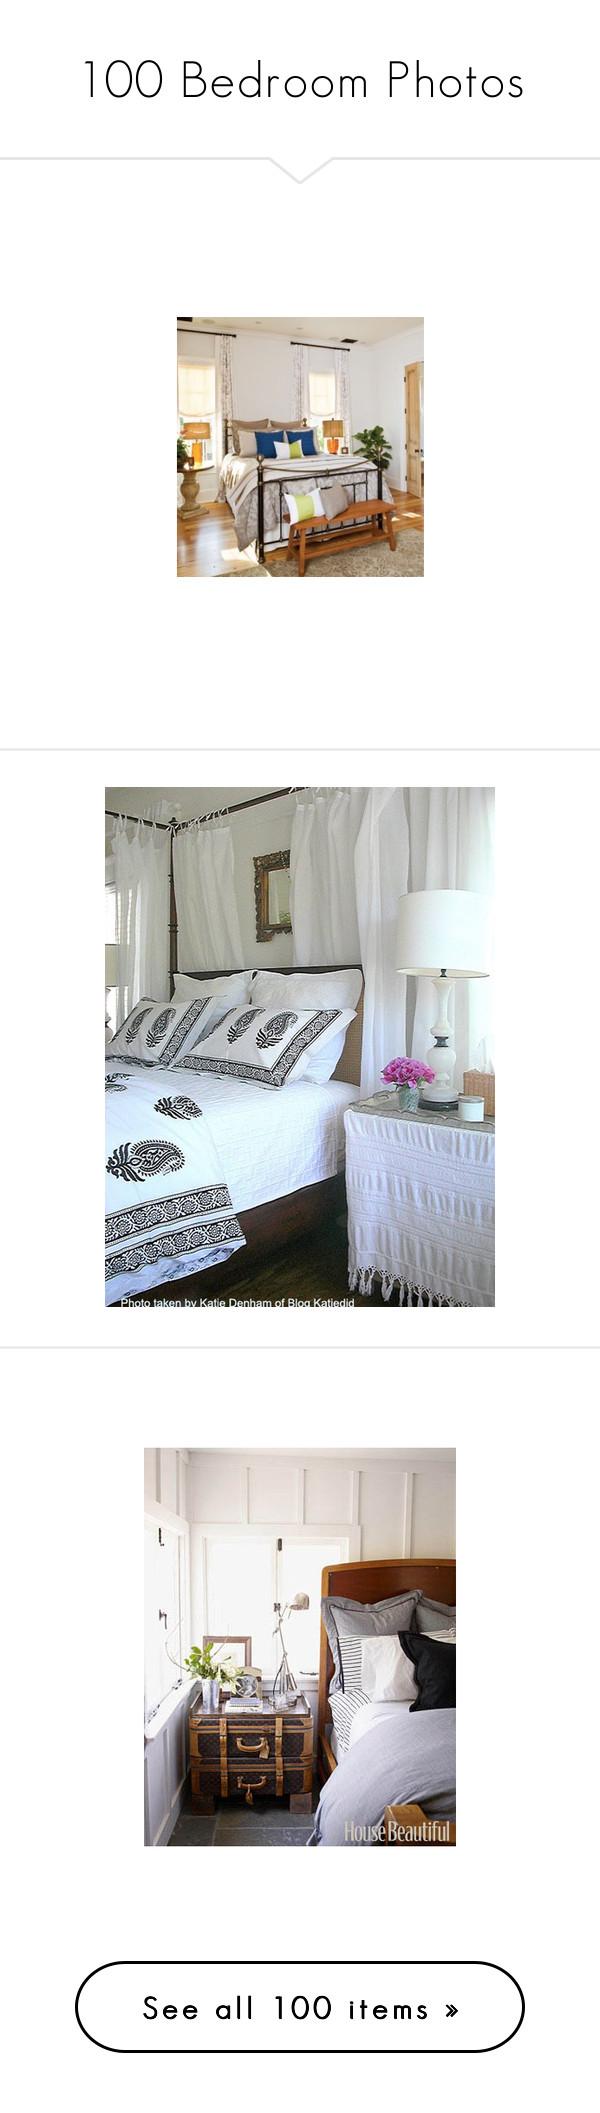 100 Bedroom Photos\